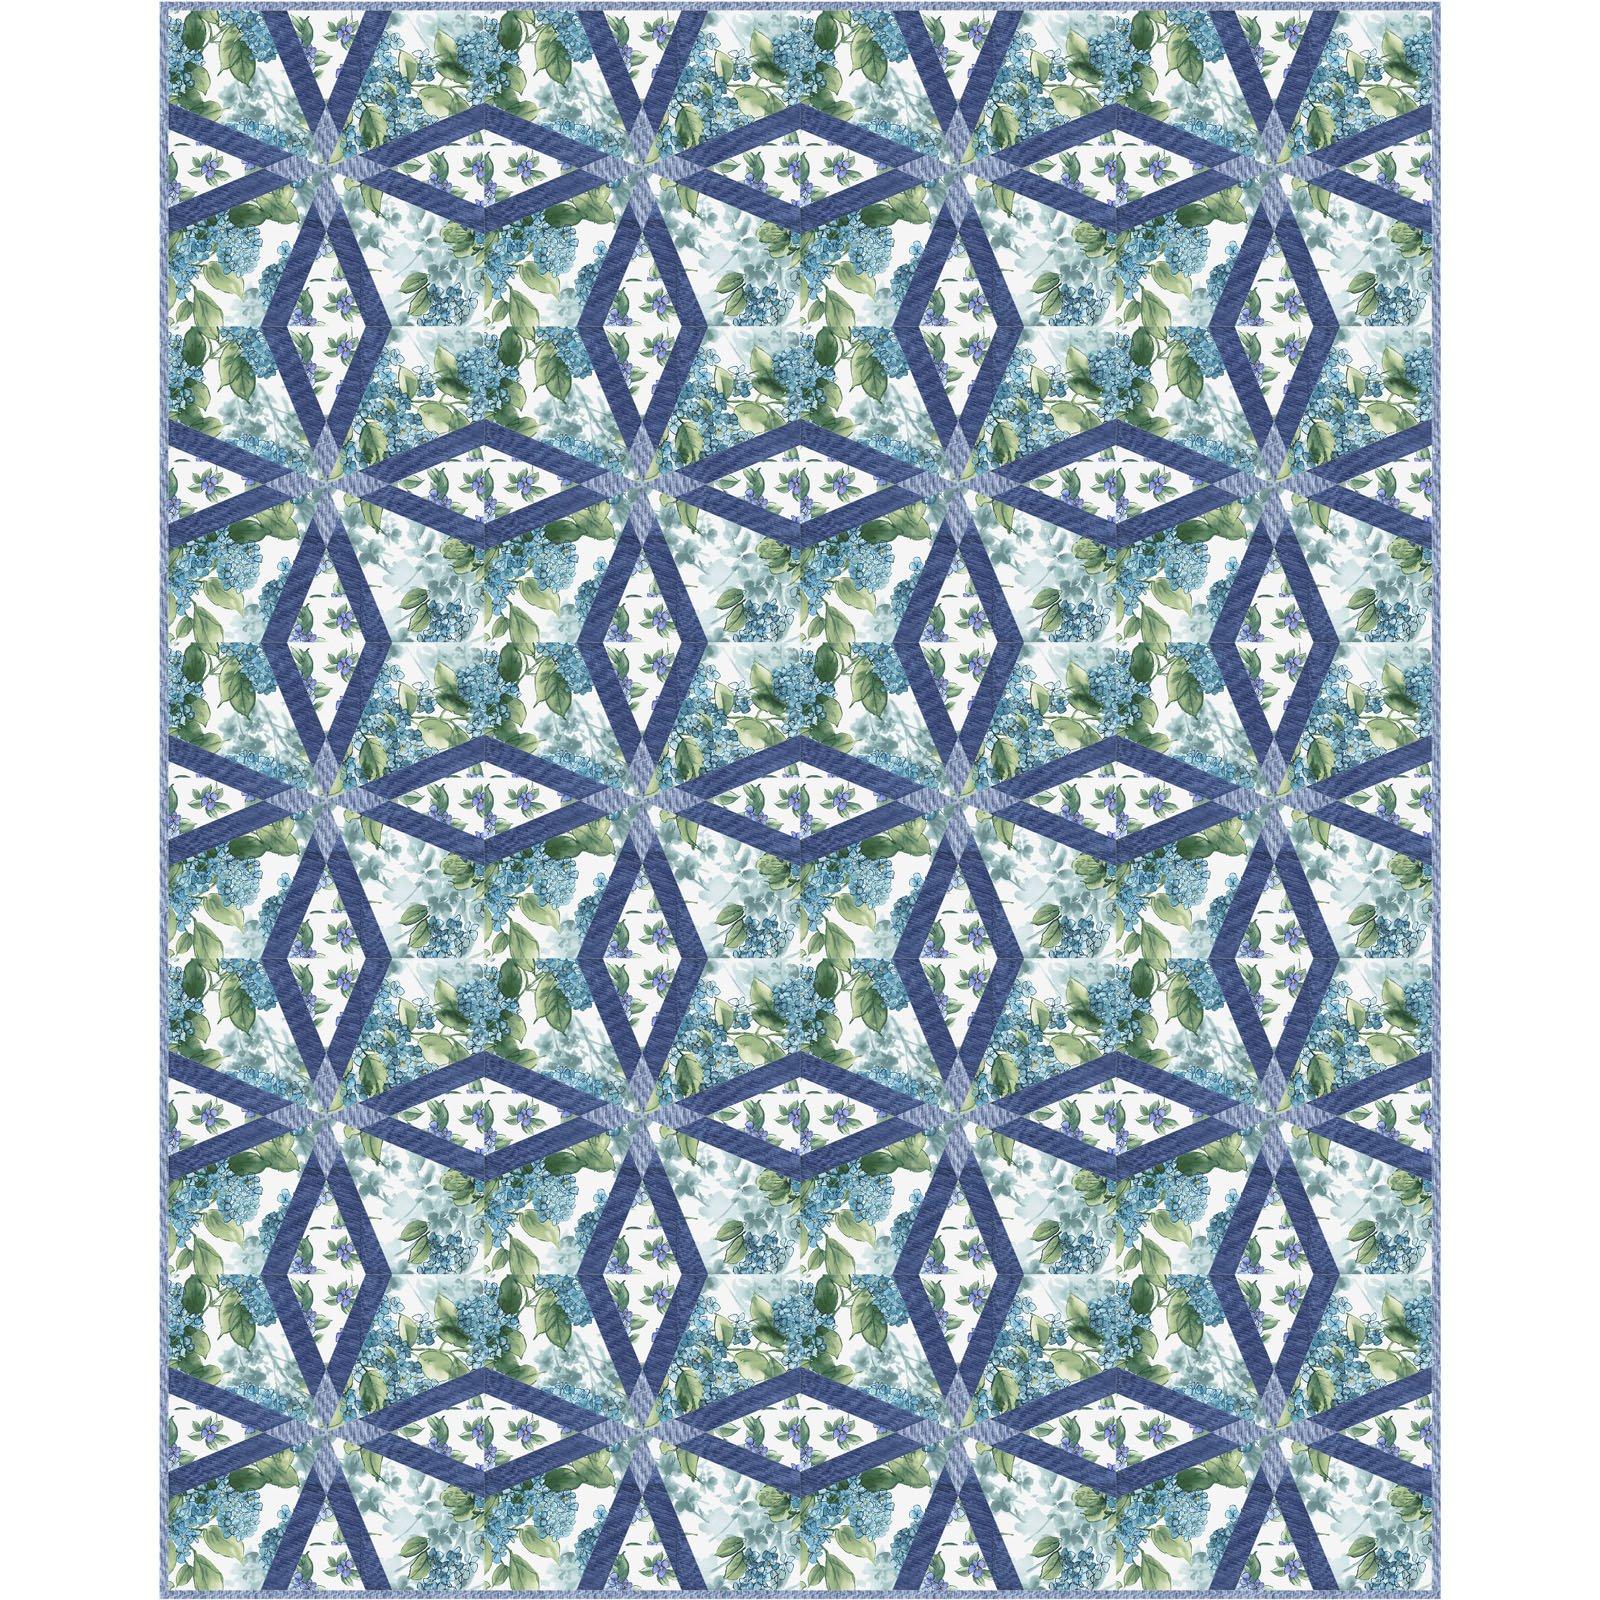 Watercolor Hydrangeas Quilt Kit